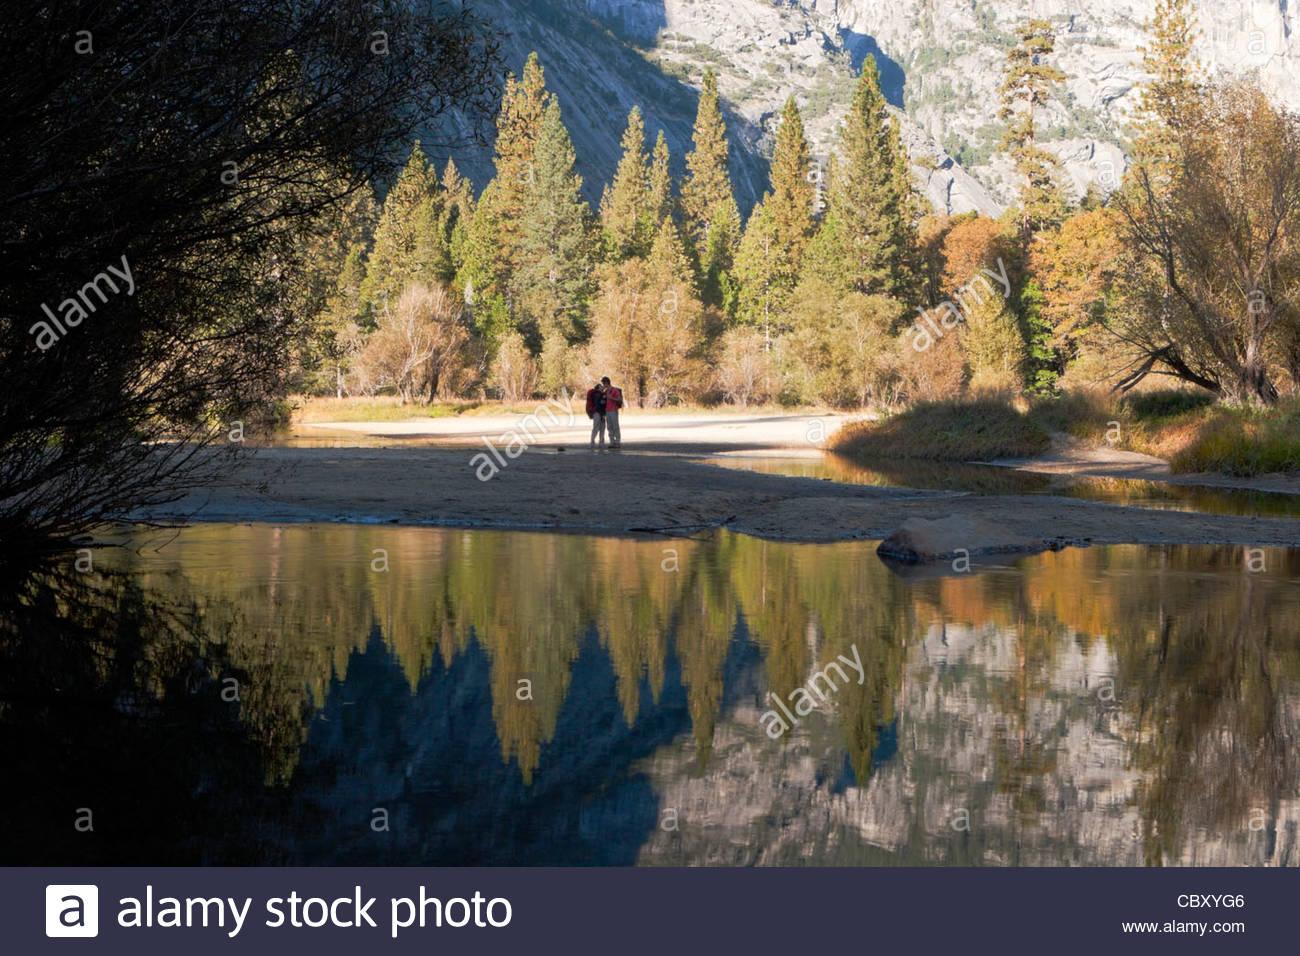 Lovers Kissing on Shoreline of Mirror Lake, Yosemite National Park, California - Stock Image